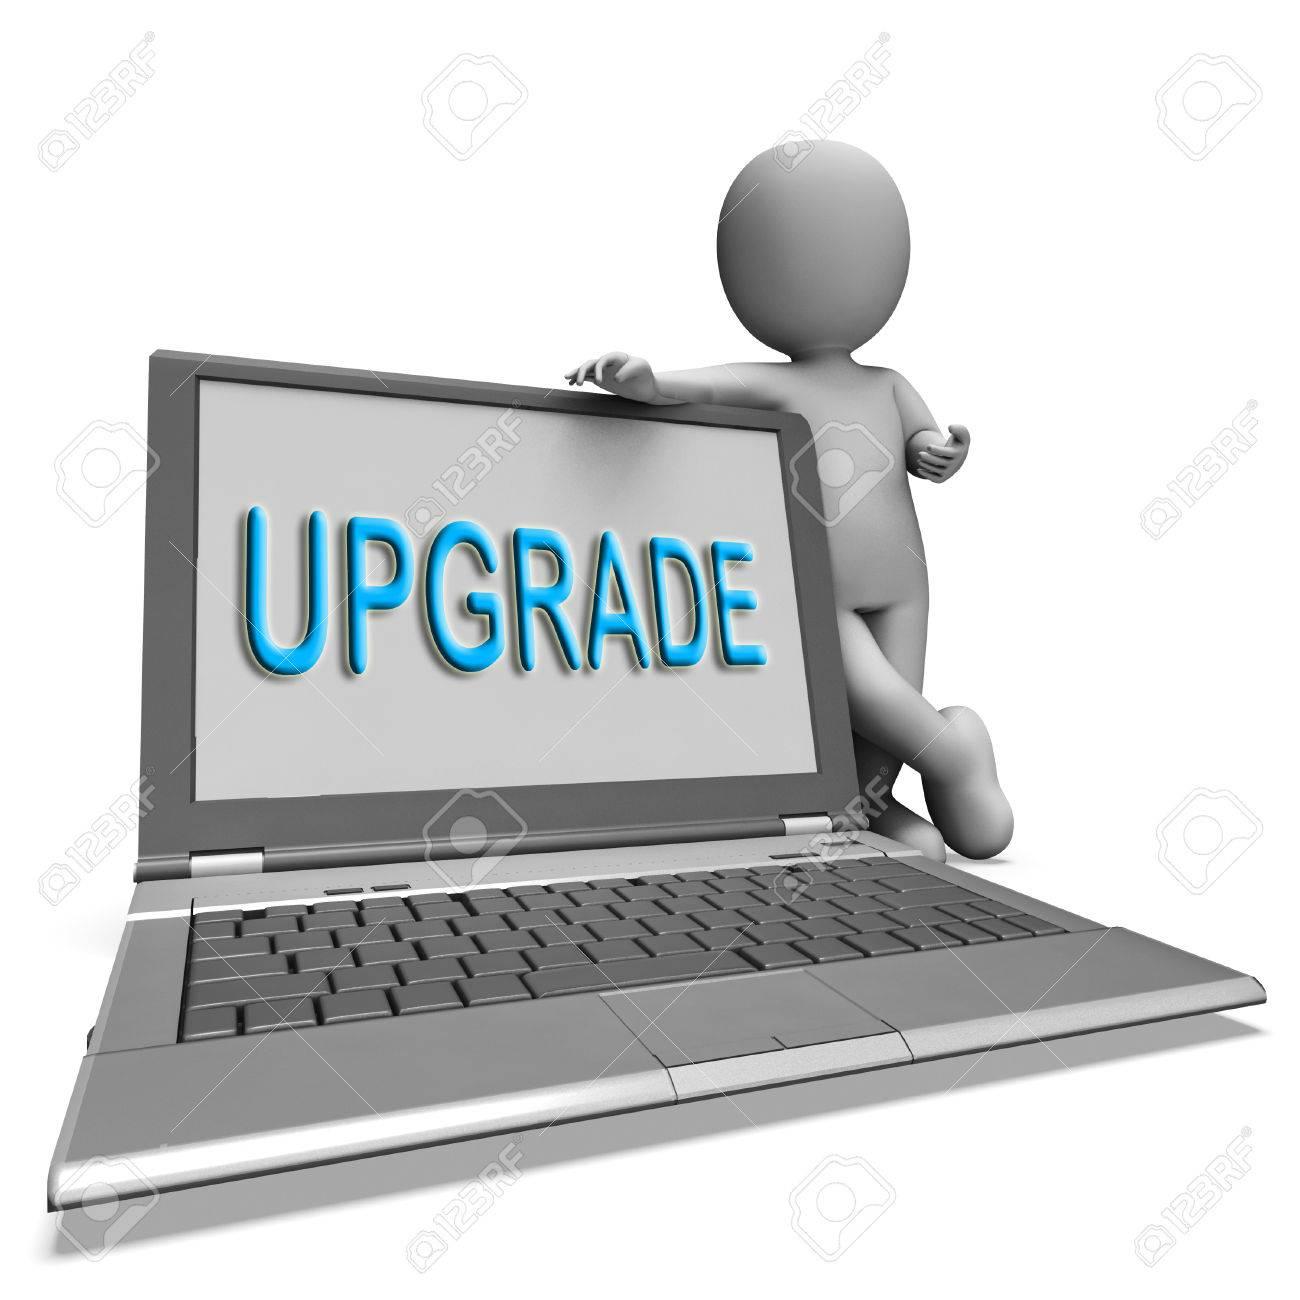 Upgrade betekenis